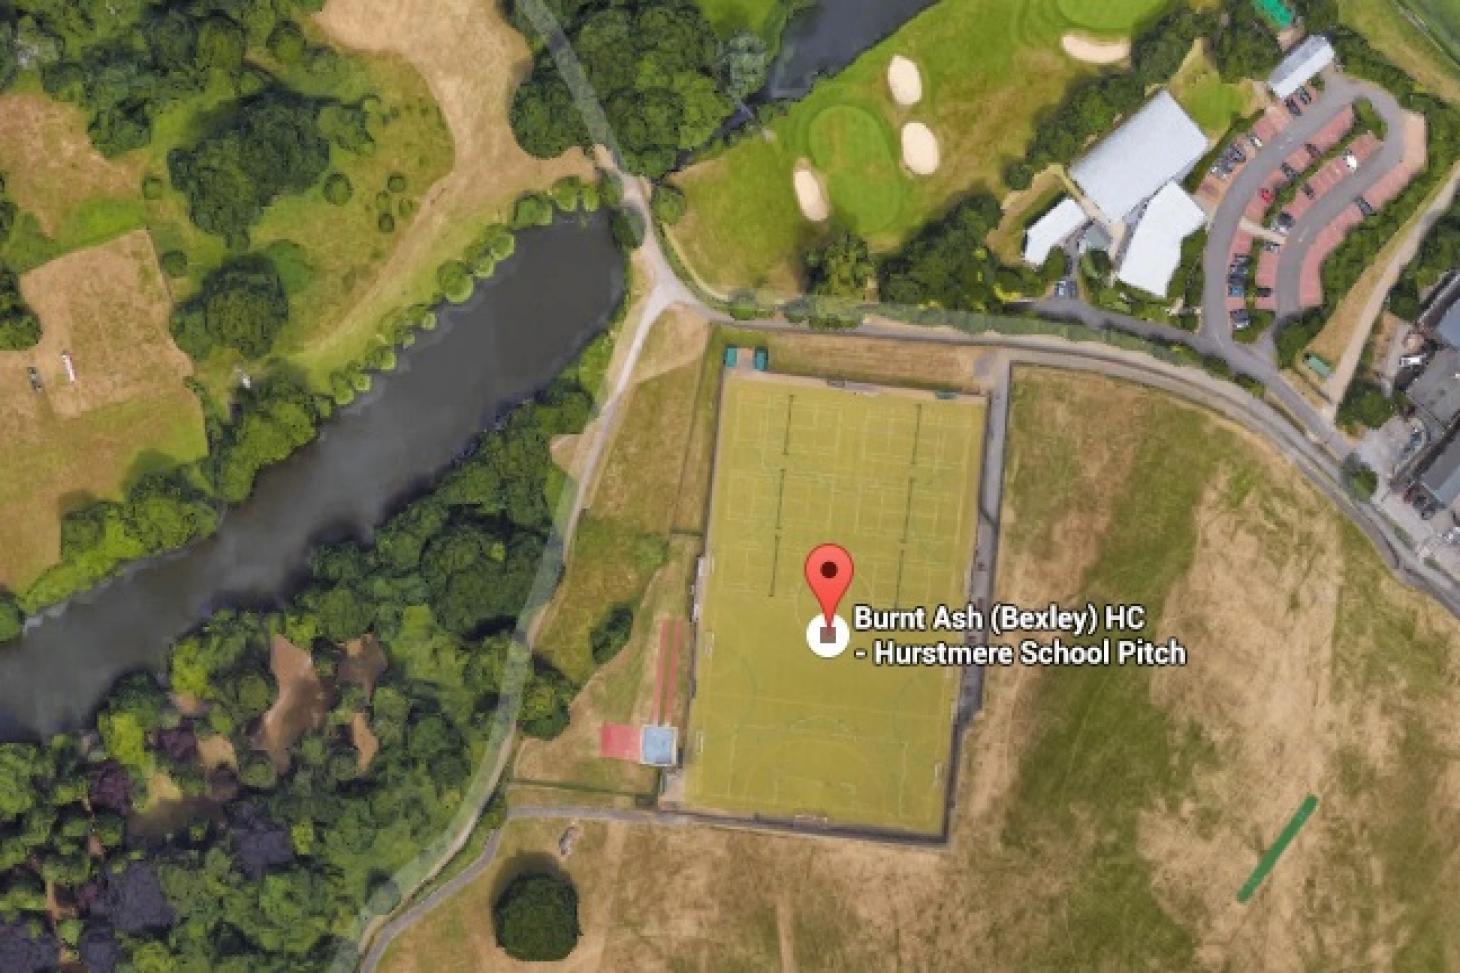 Burnt Ash Hockey Club, Hurstmere School Pitch Outdoor | Astroturf tennis court